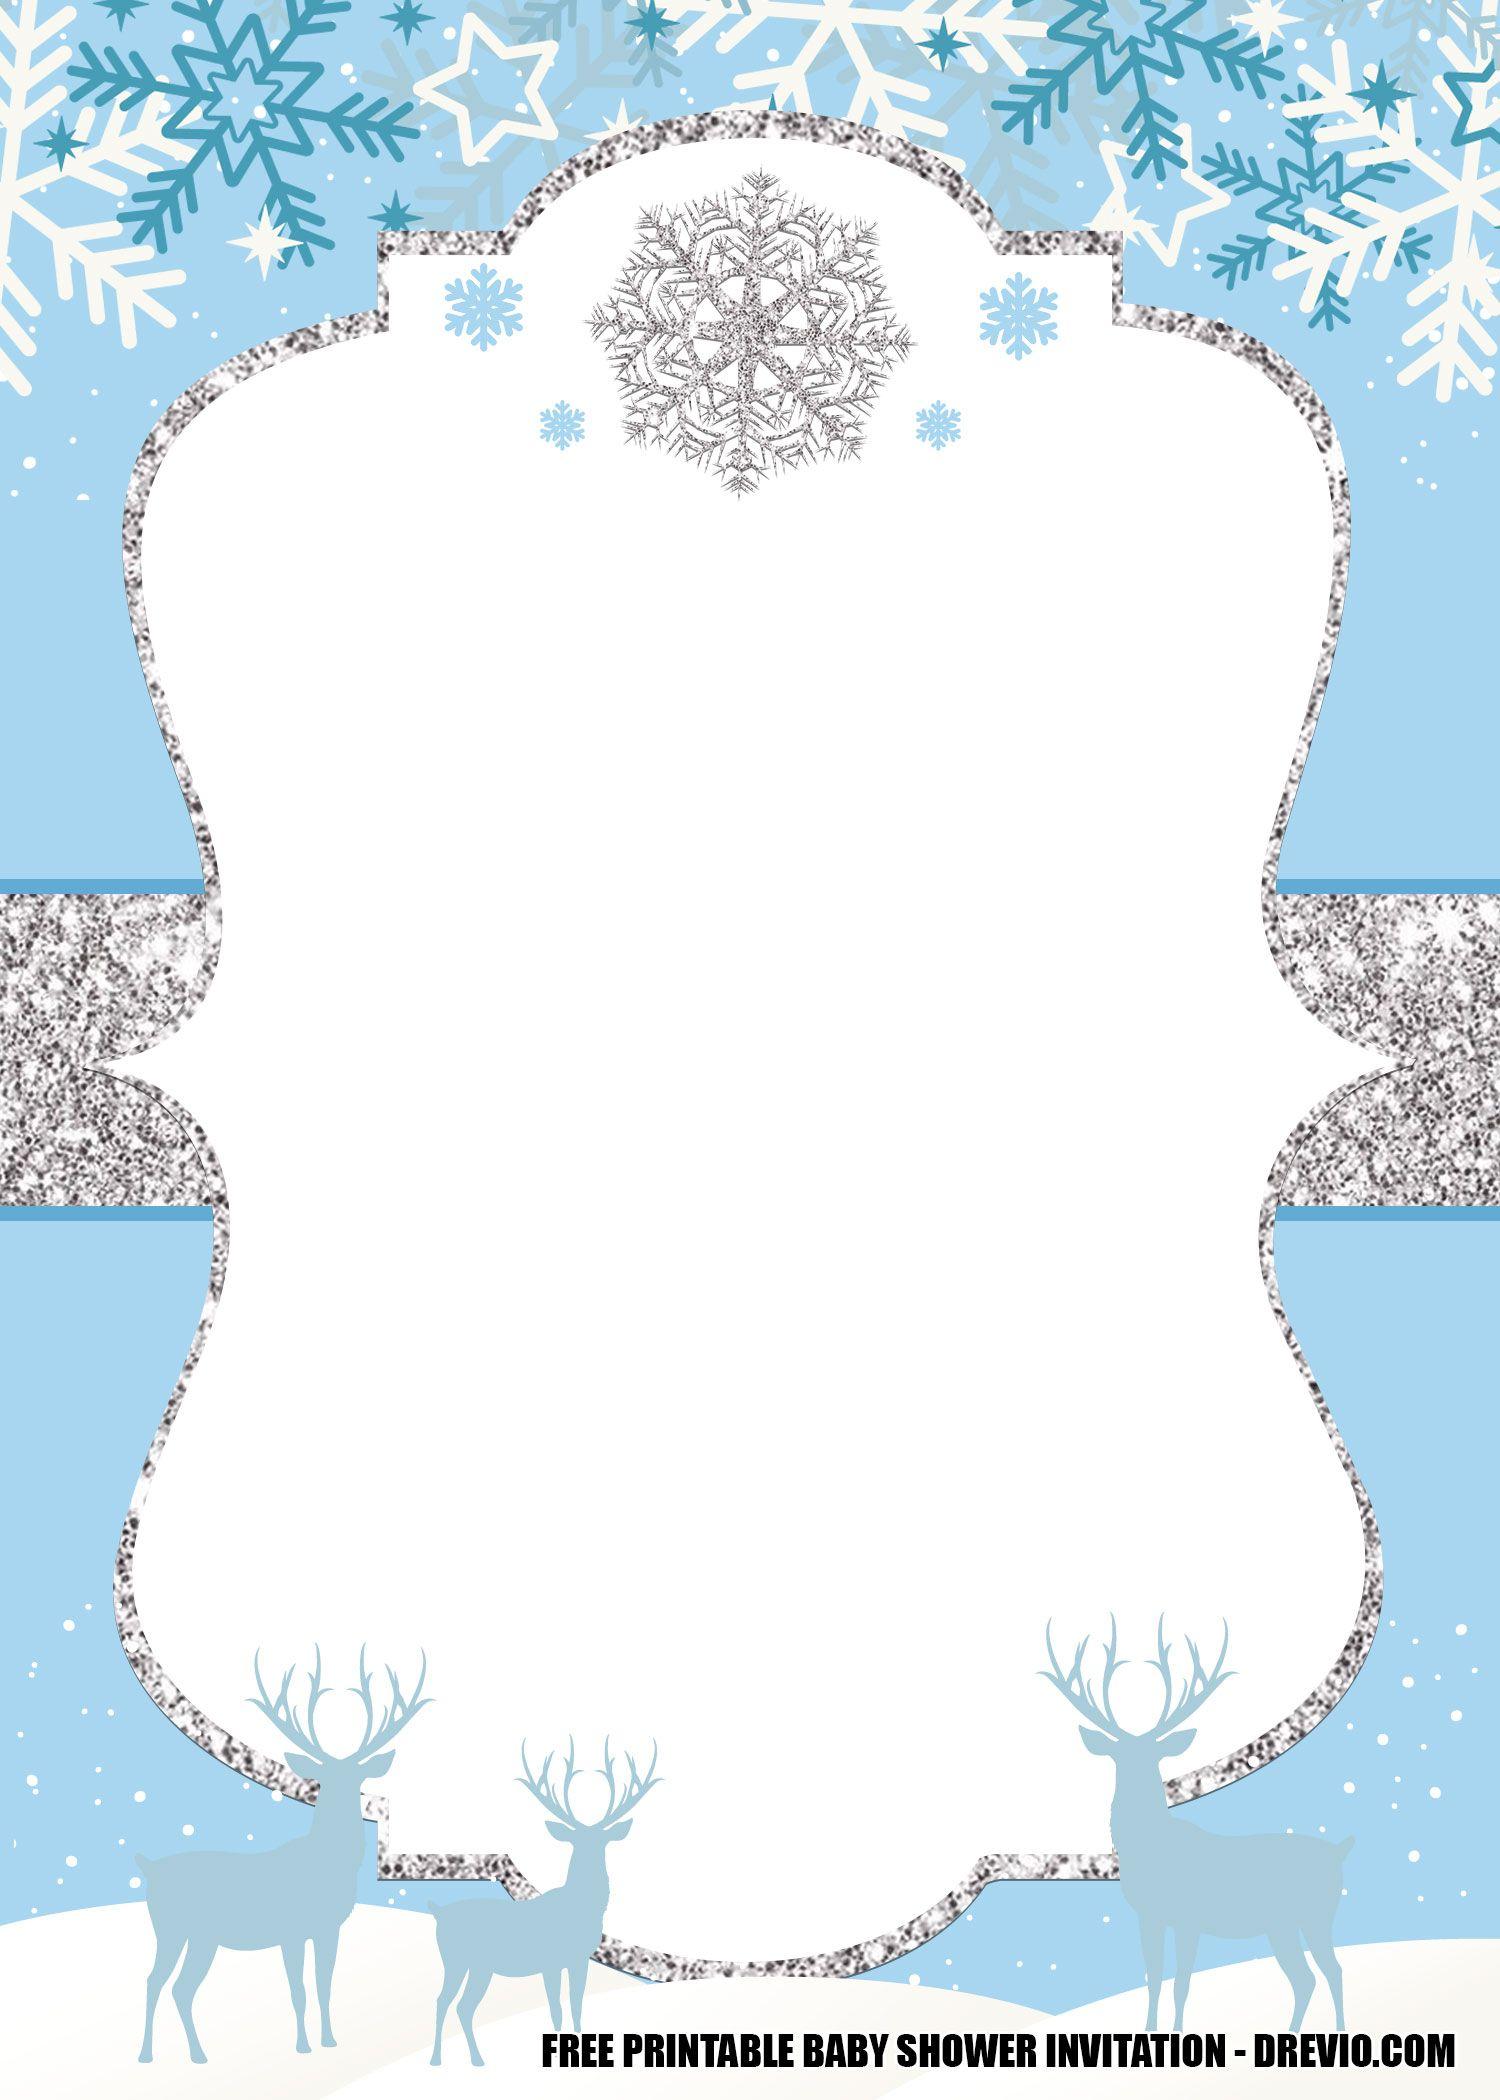 Free Winter Wonderland Baby Shower Invitation Templates Editable Winter Wonderland Invitations Baby Shower Invitation Templates Winter Wonderland Baby Shower